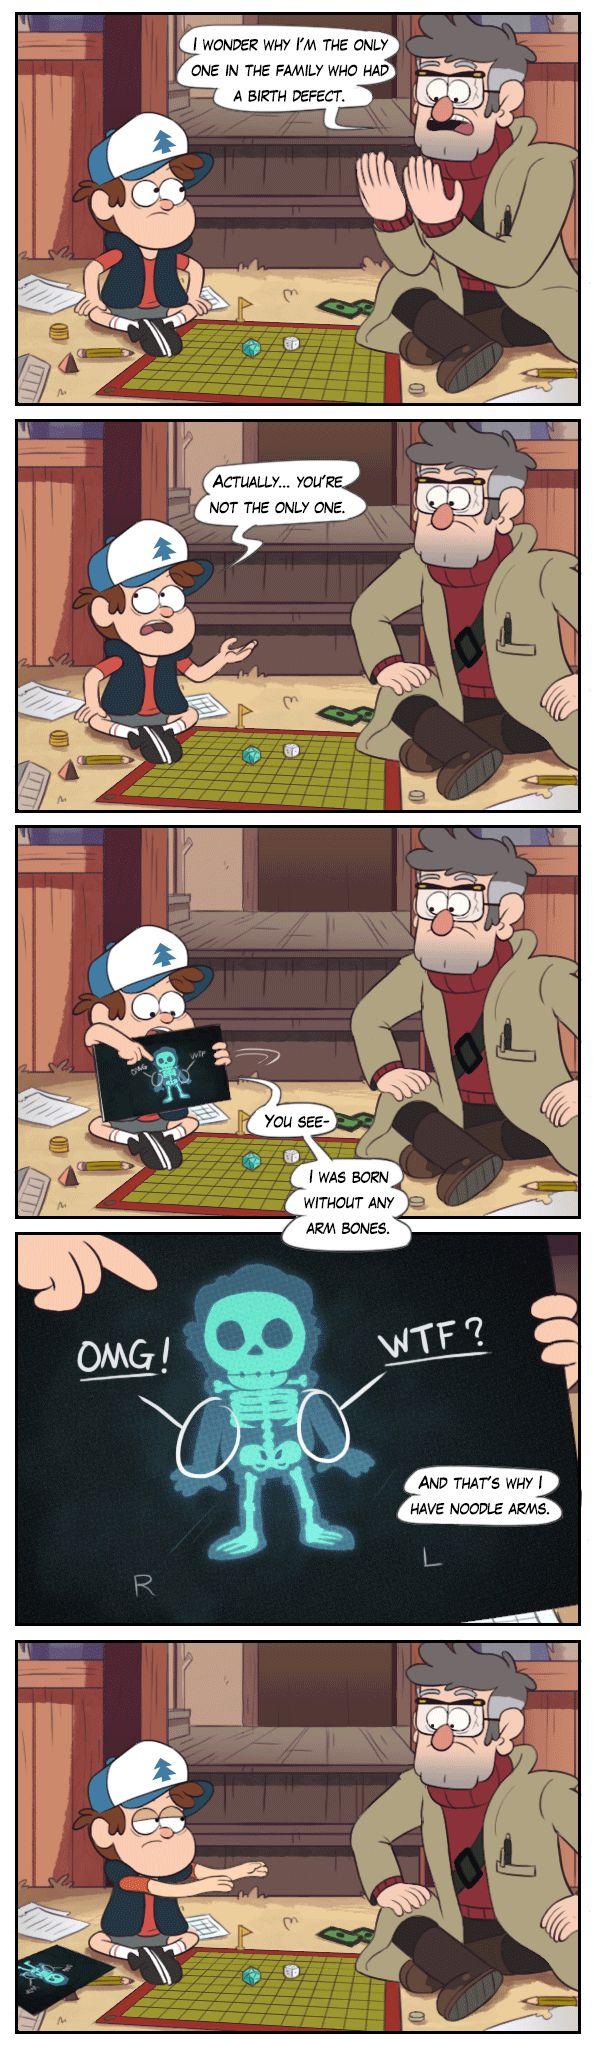 GF Комиксы,Gravity Falls,фэндомы,Dipper Pines,GF Персонажи,Stanford Pines